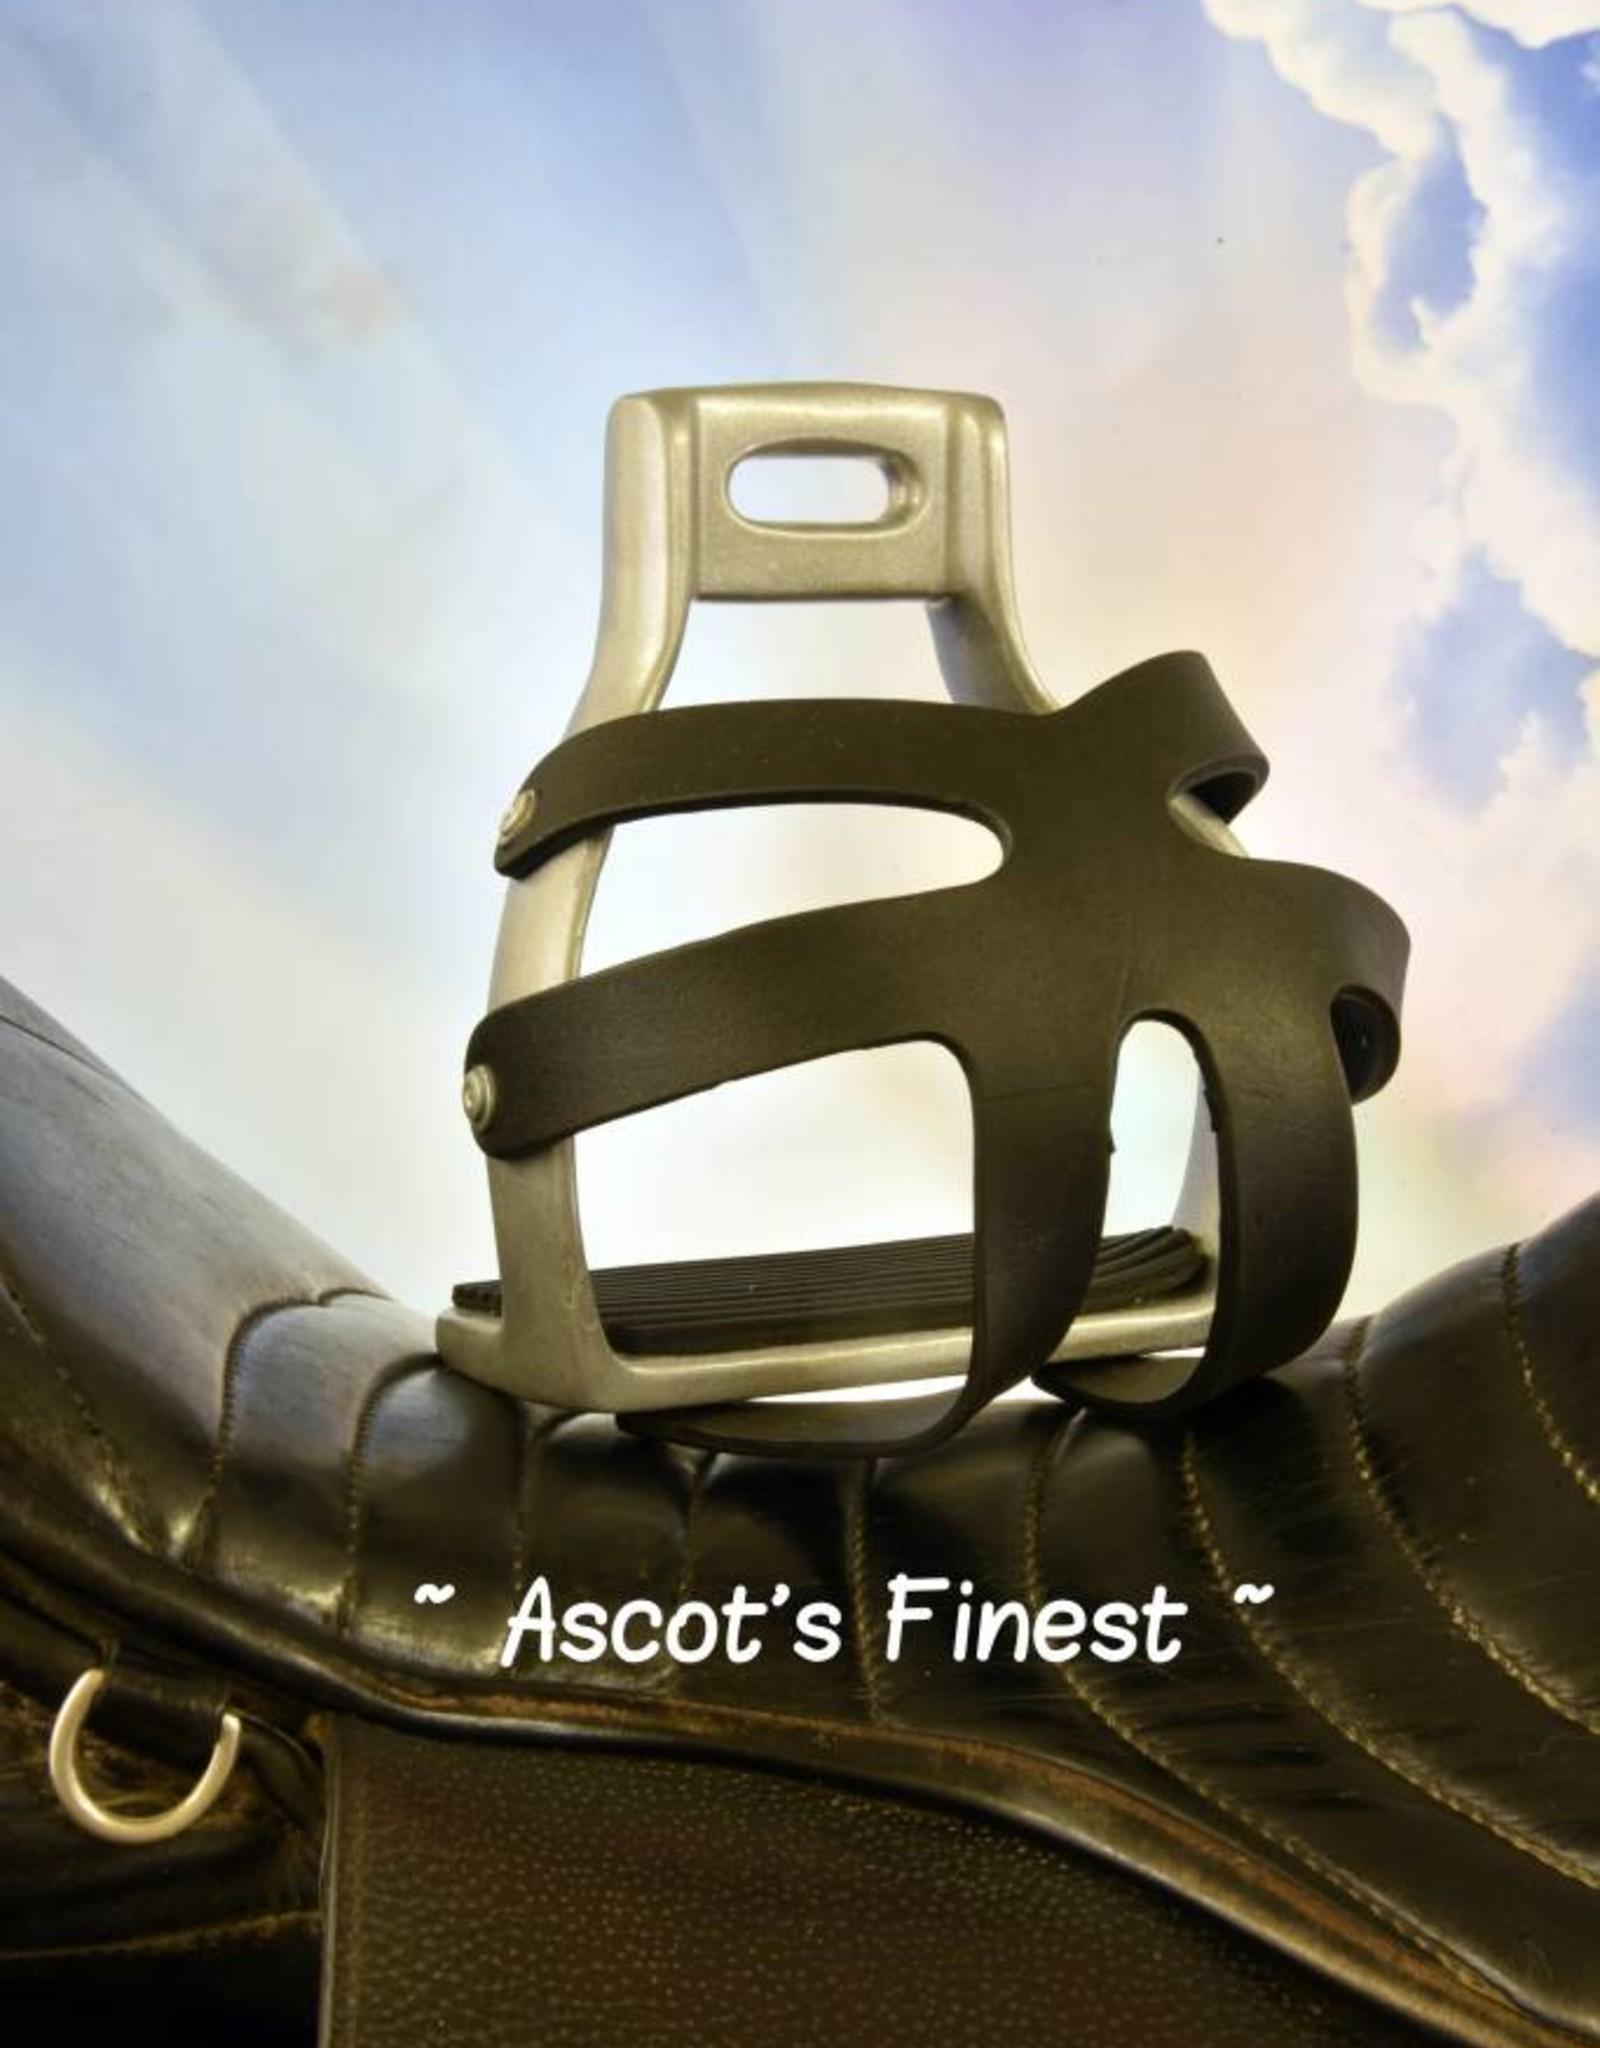 Ascot's Finest Cross stijgbuegels